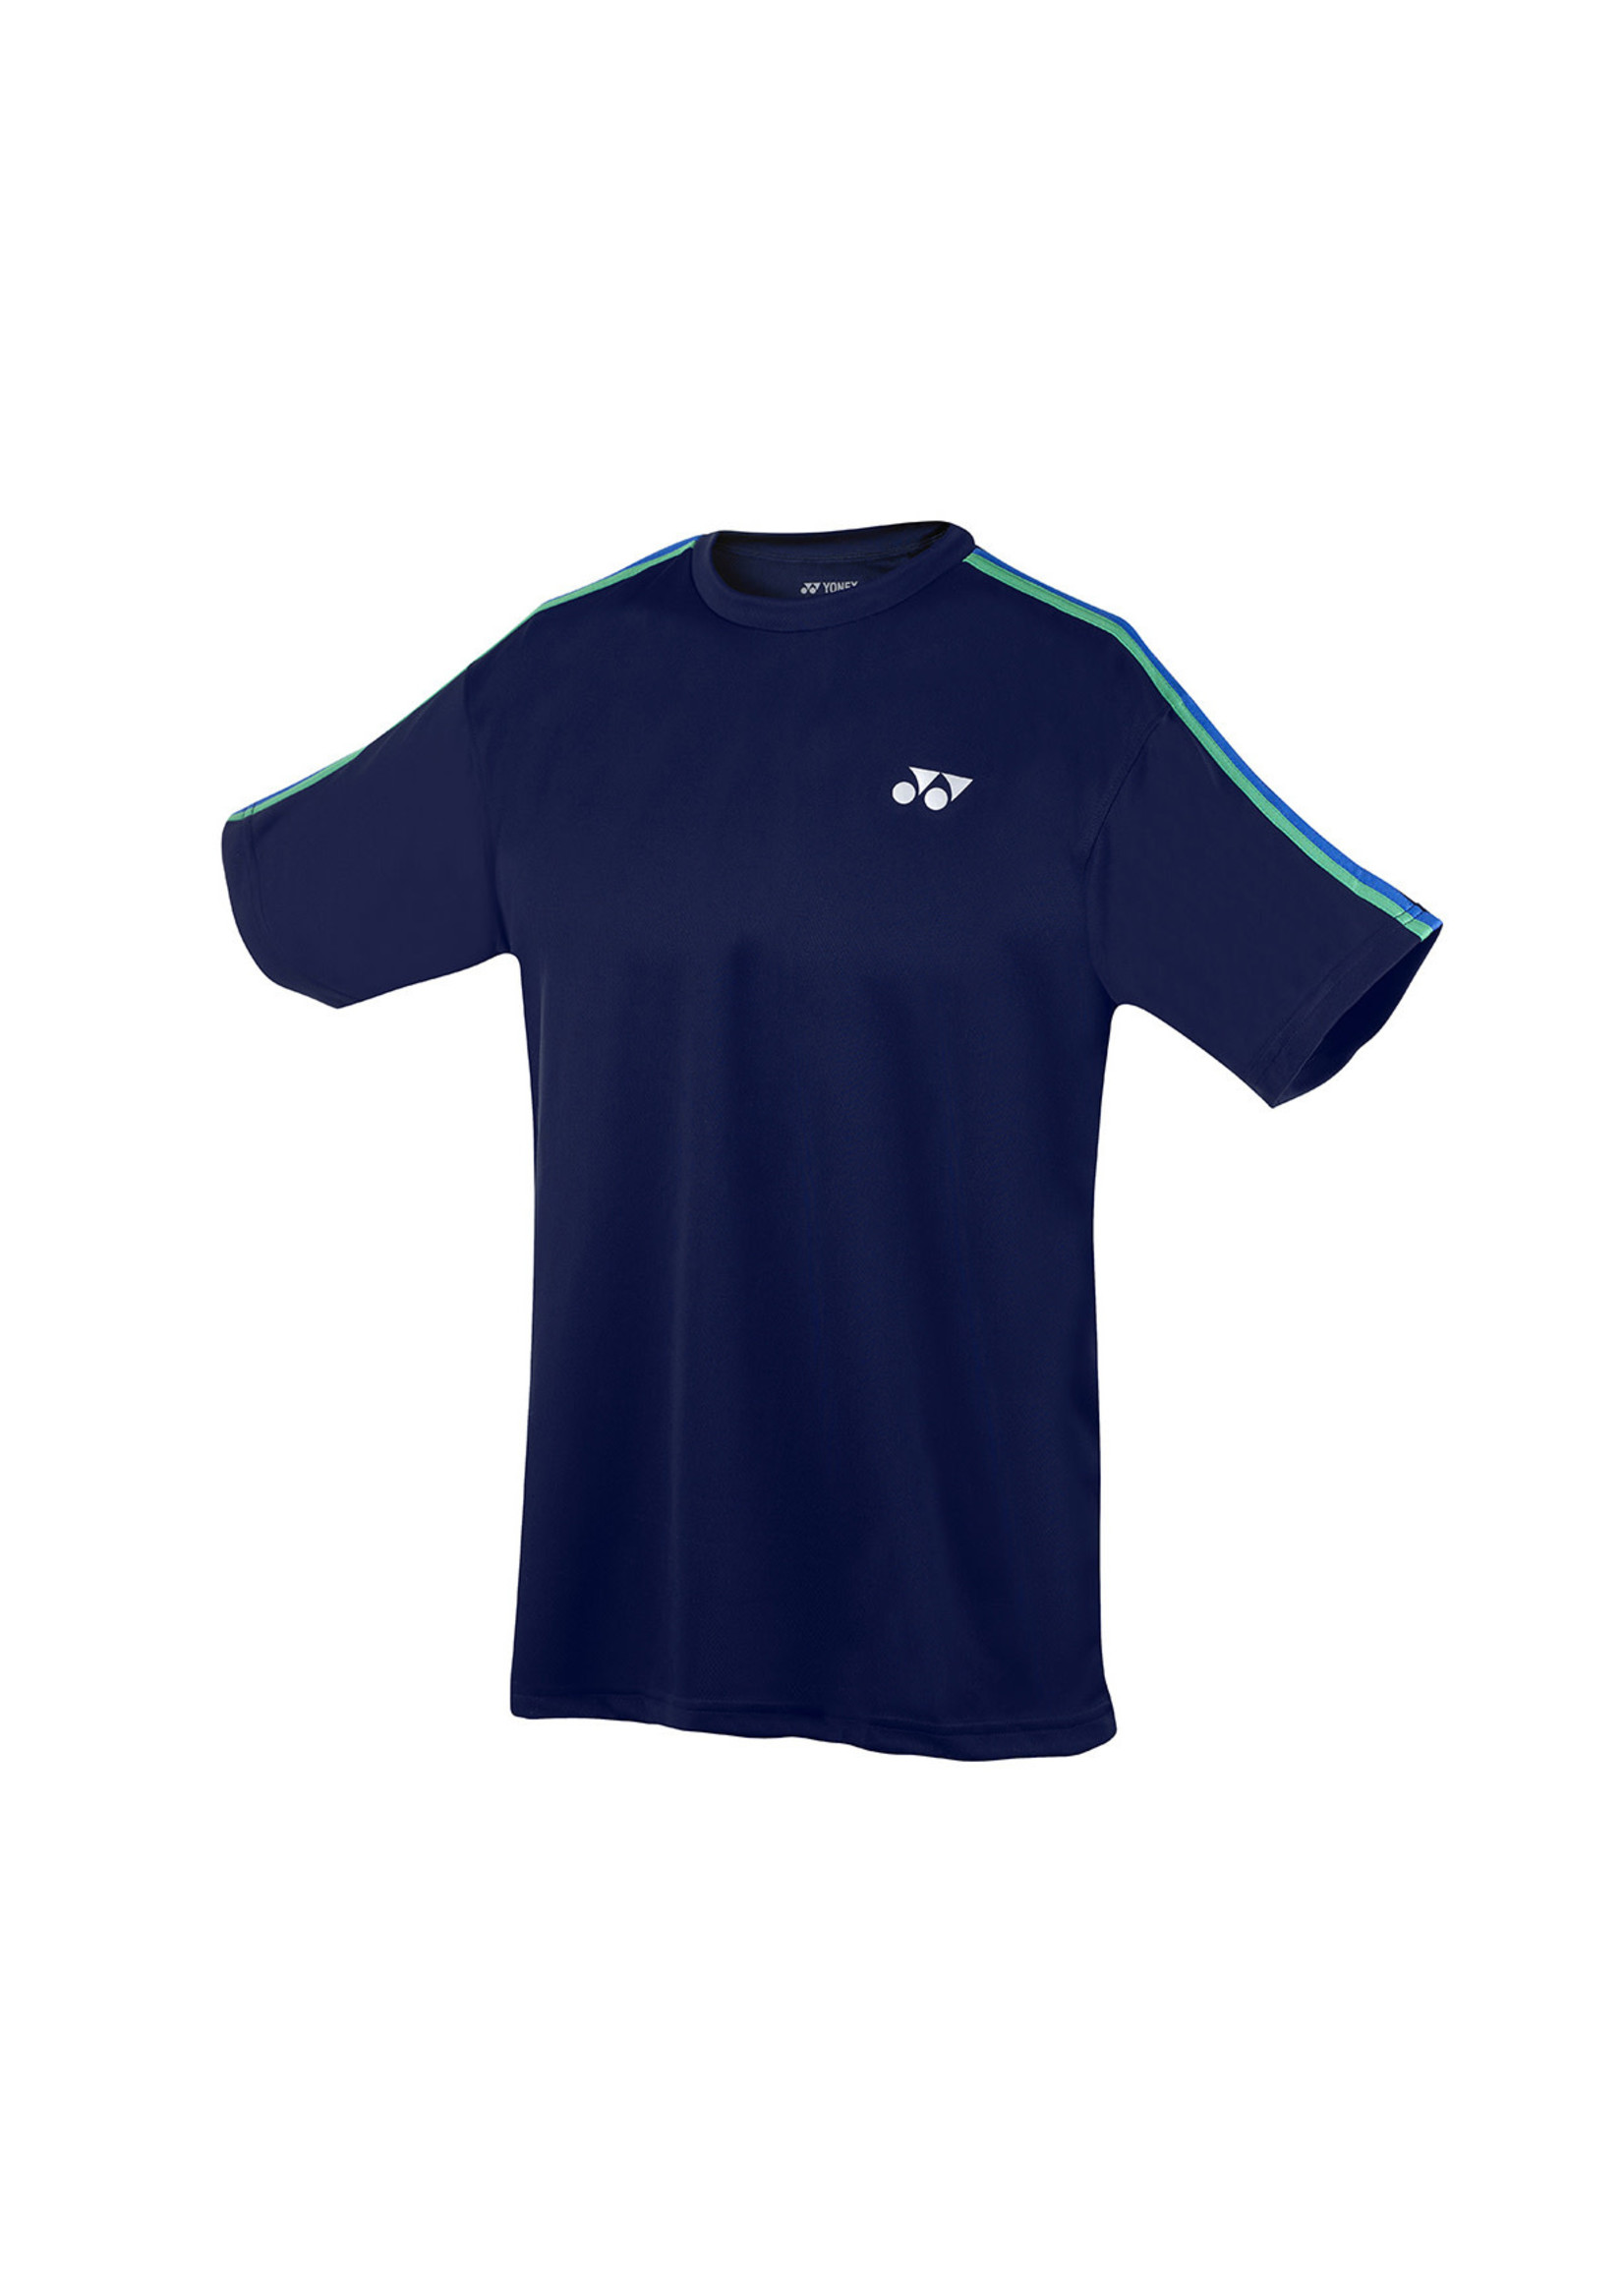 Yonex Yonex YT1004 Mens T Shirt (2018) Navy Xl